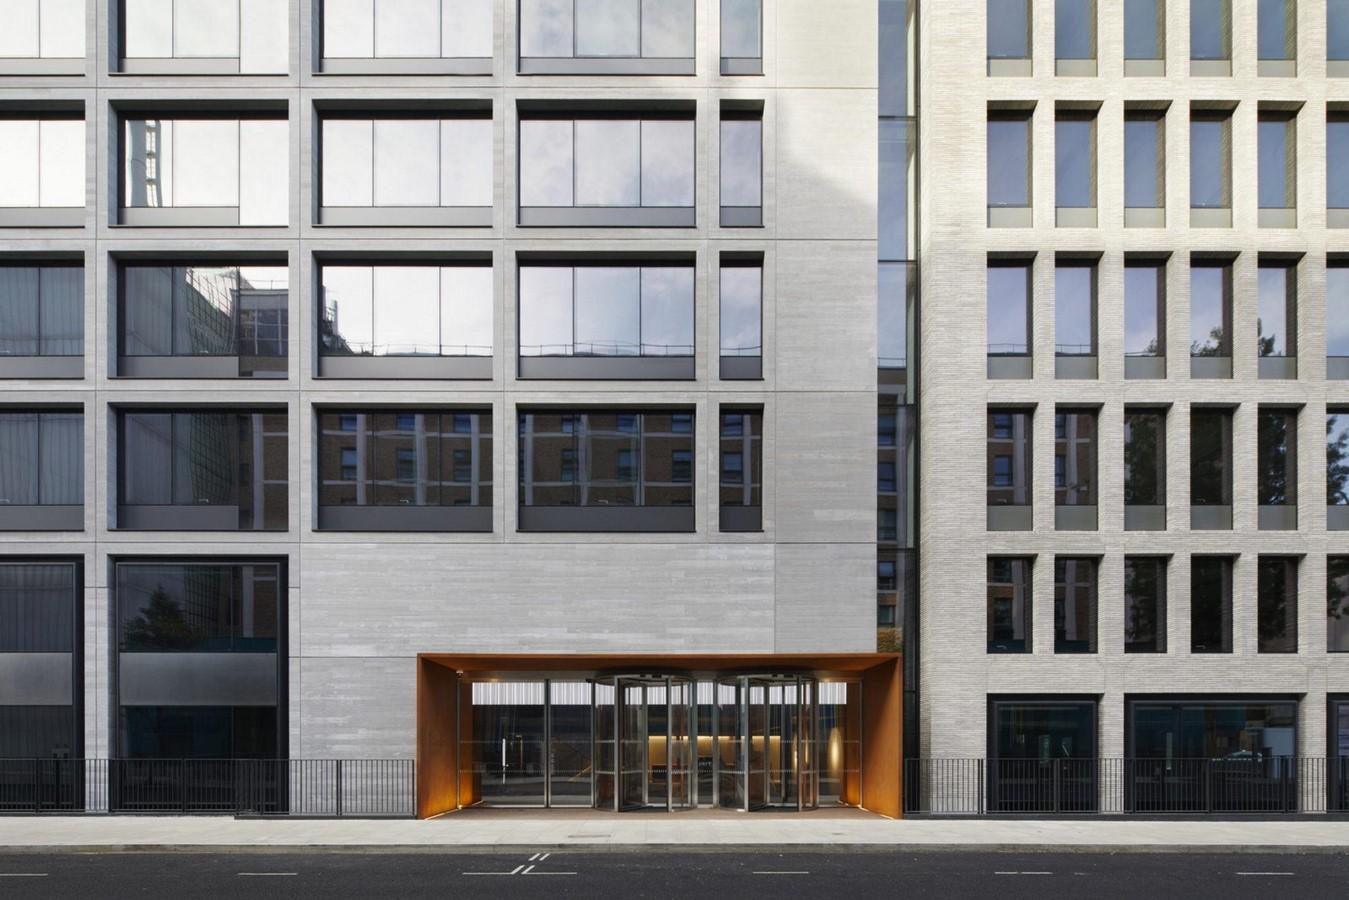 Mixed-Use Buildings - Sheet2